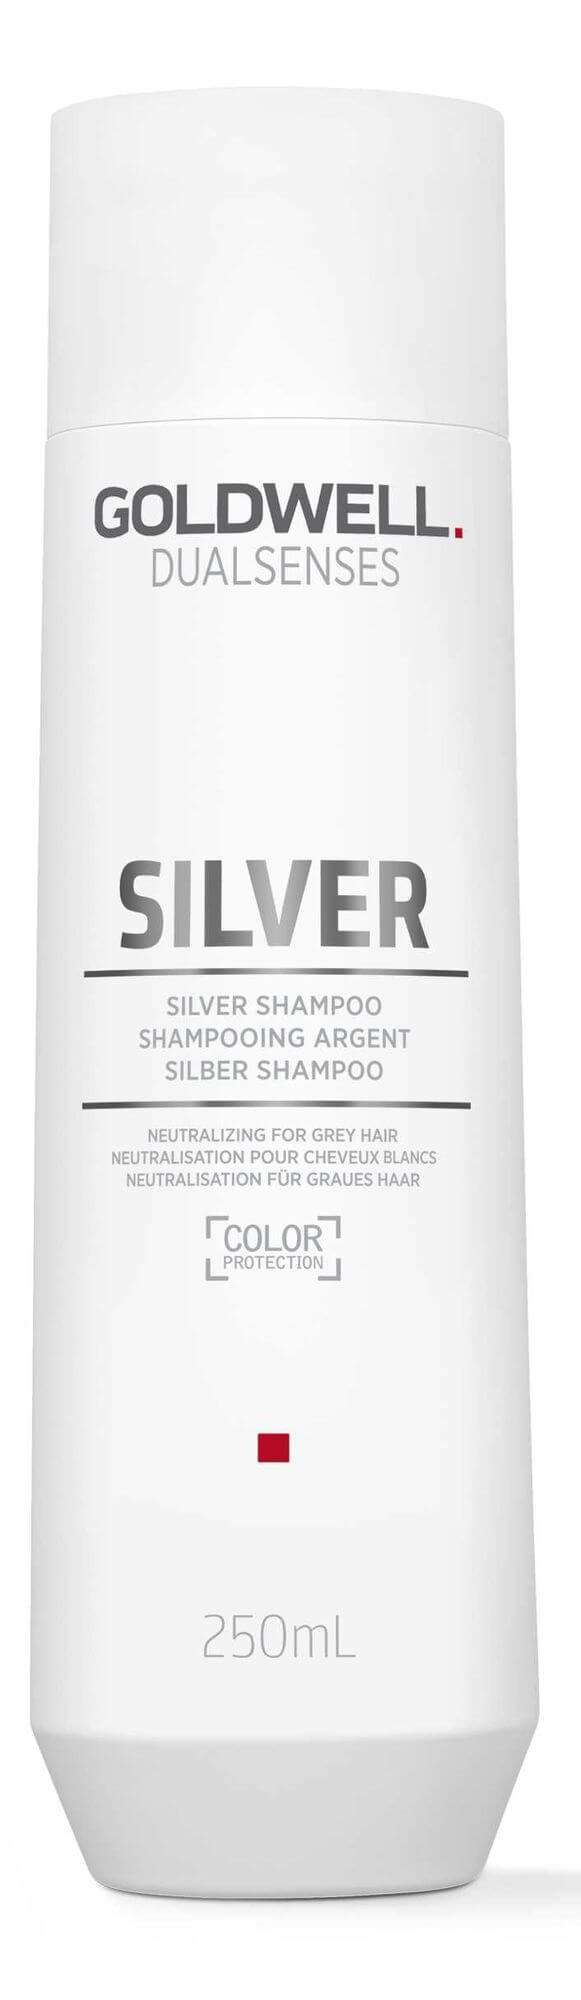 Dualsenses Silver Silver Shampoo